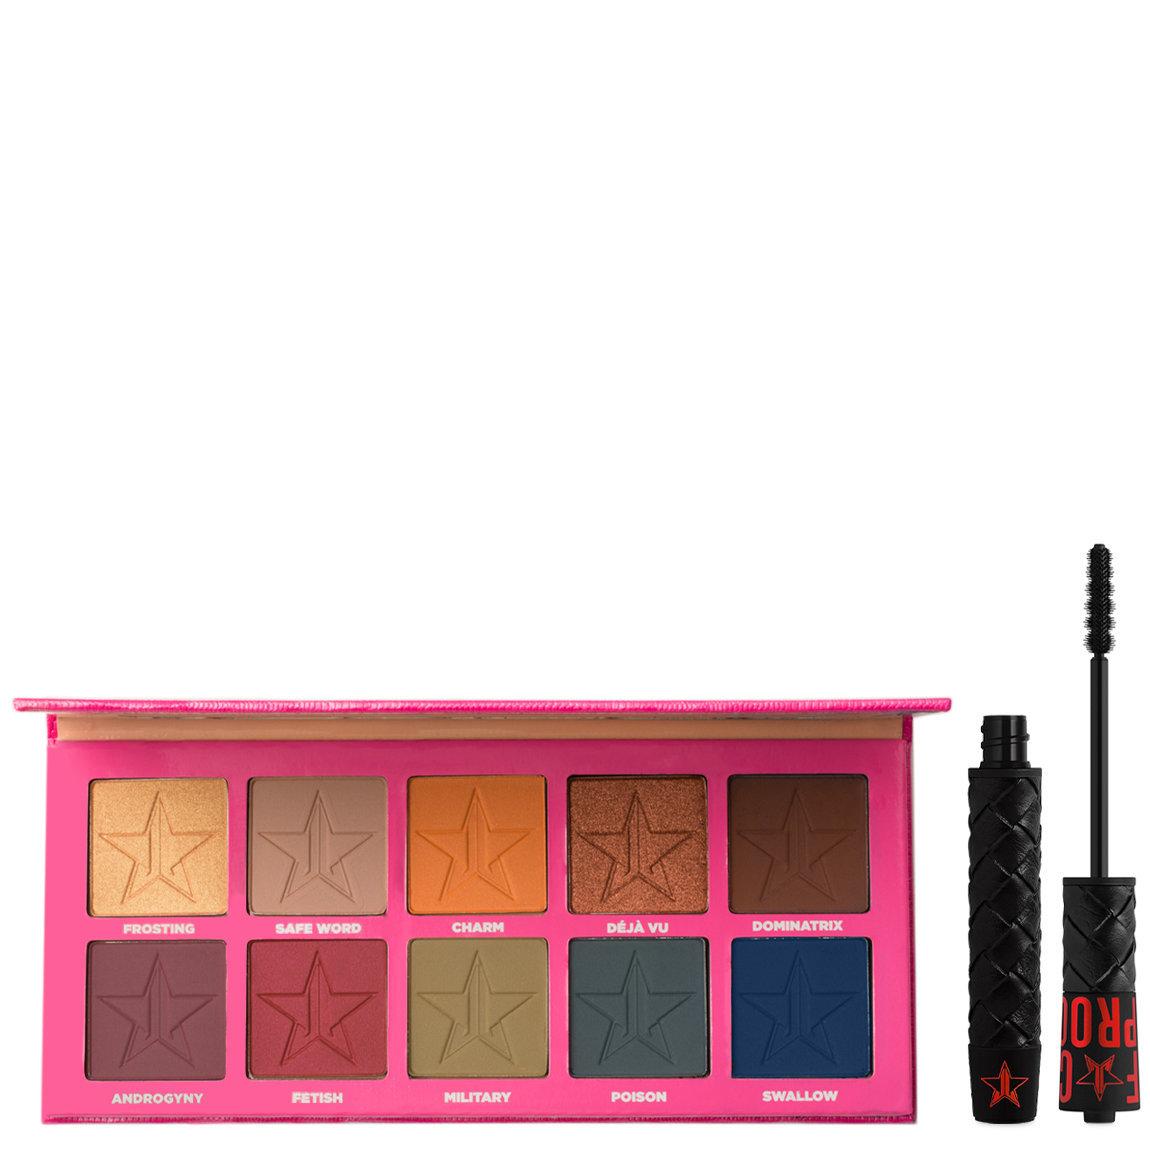 Jeffree Star Cosmetics Androgyny Eyeshadow Palette + F*ck Proof Mascara alternative view 1 - product swatch.